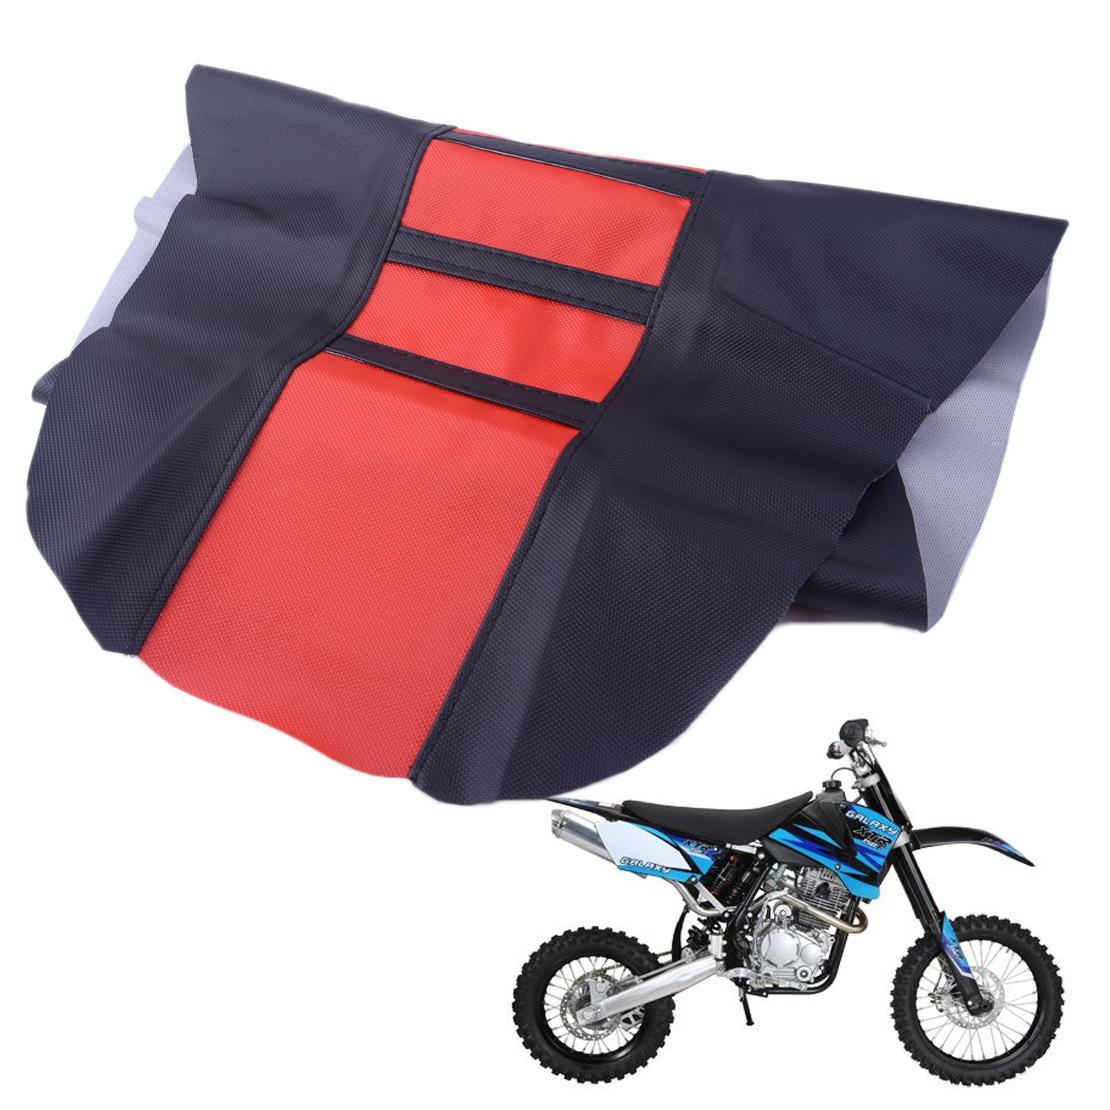 Universalgreifer Soft Sitzbezug f/ür Yamaha All Bike Dirt Motorrad Blau